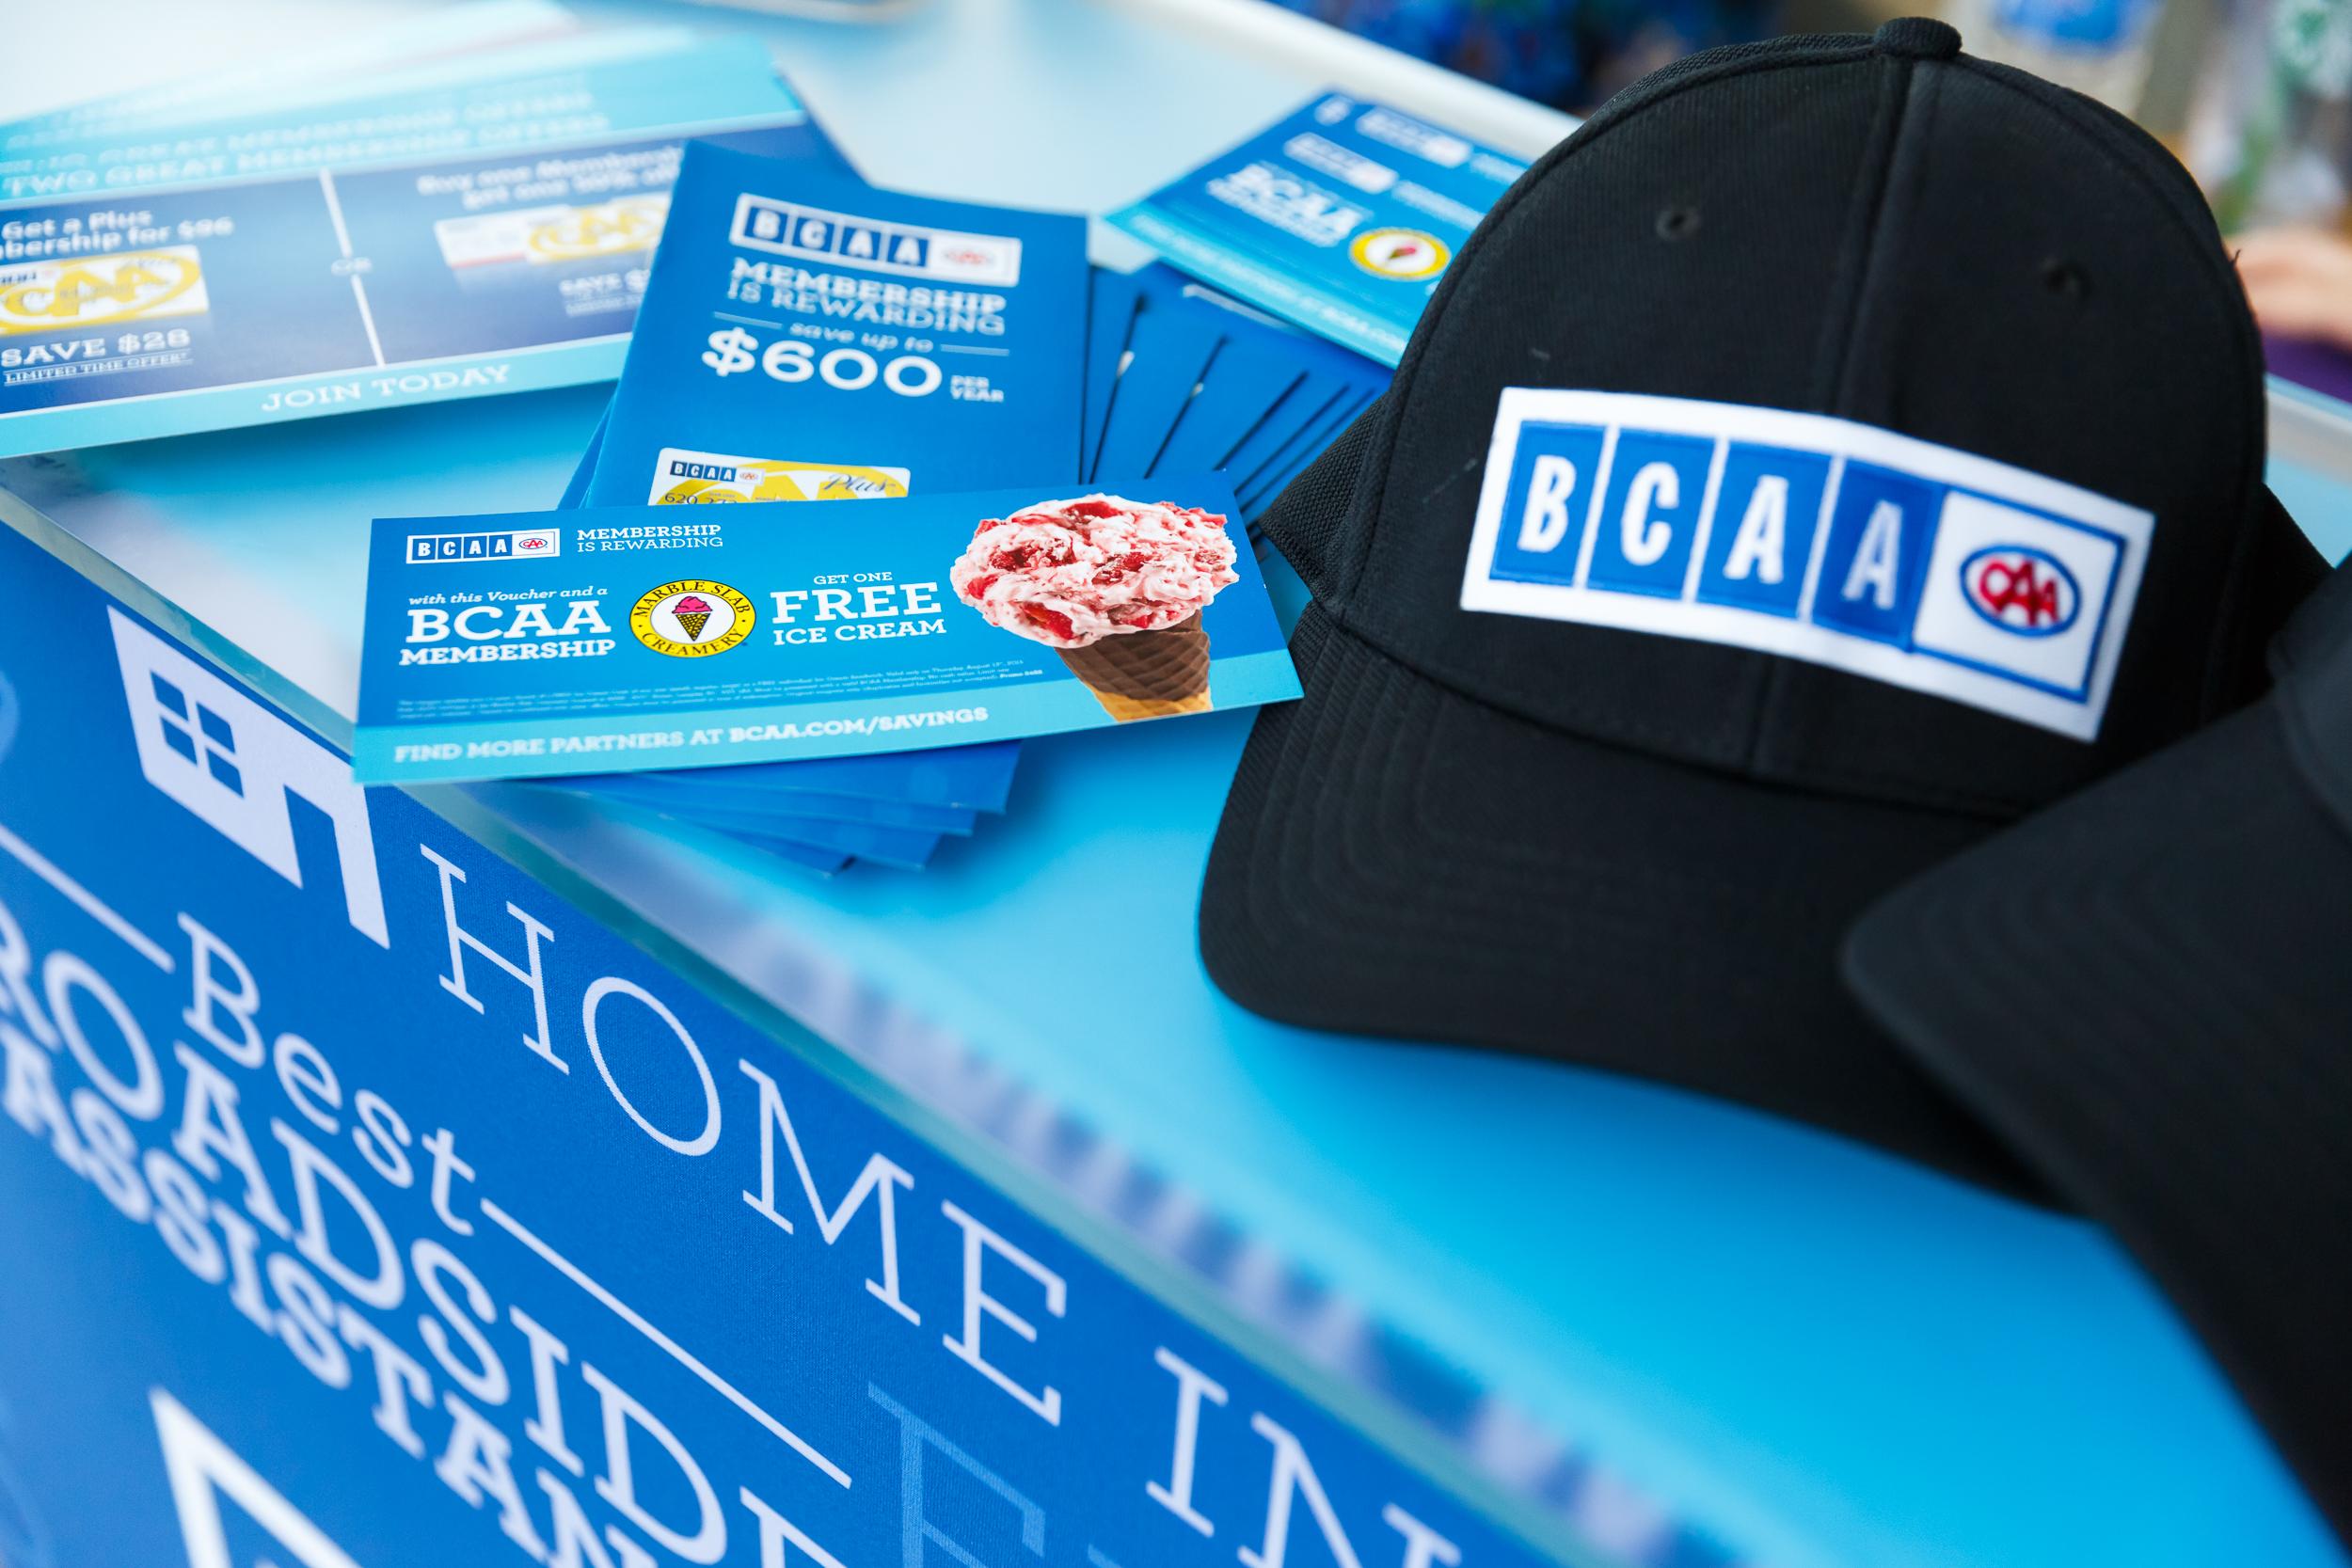 BCAA-Member-Rewards-image10.jpg